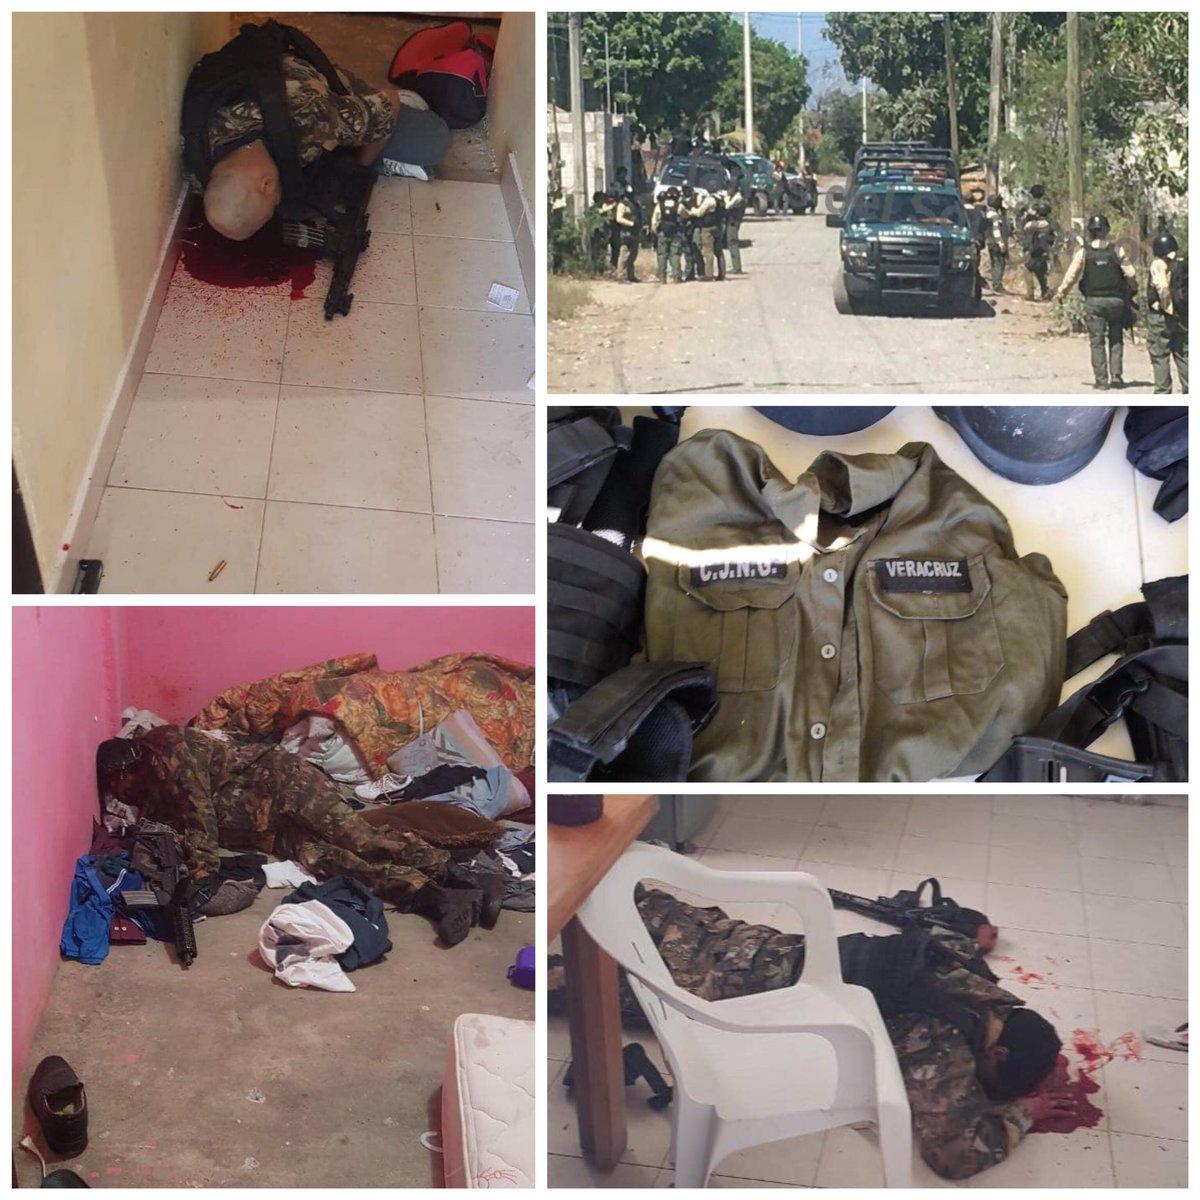 Imagenes de la Batalla, Fuerza Civil abate a 3 Sicarios del CJNG en Zempoala, Veracruz